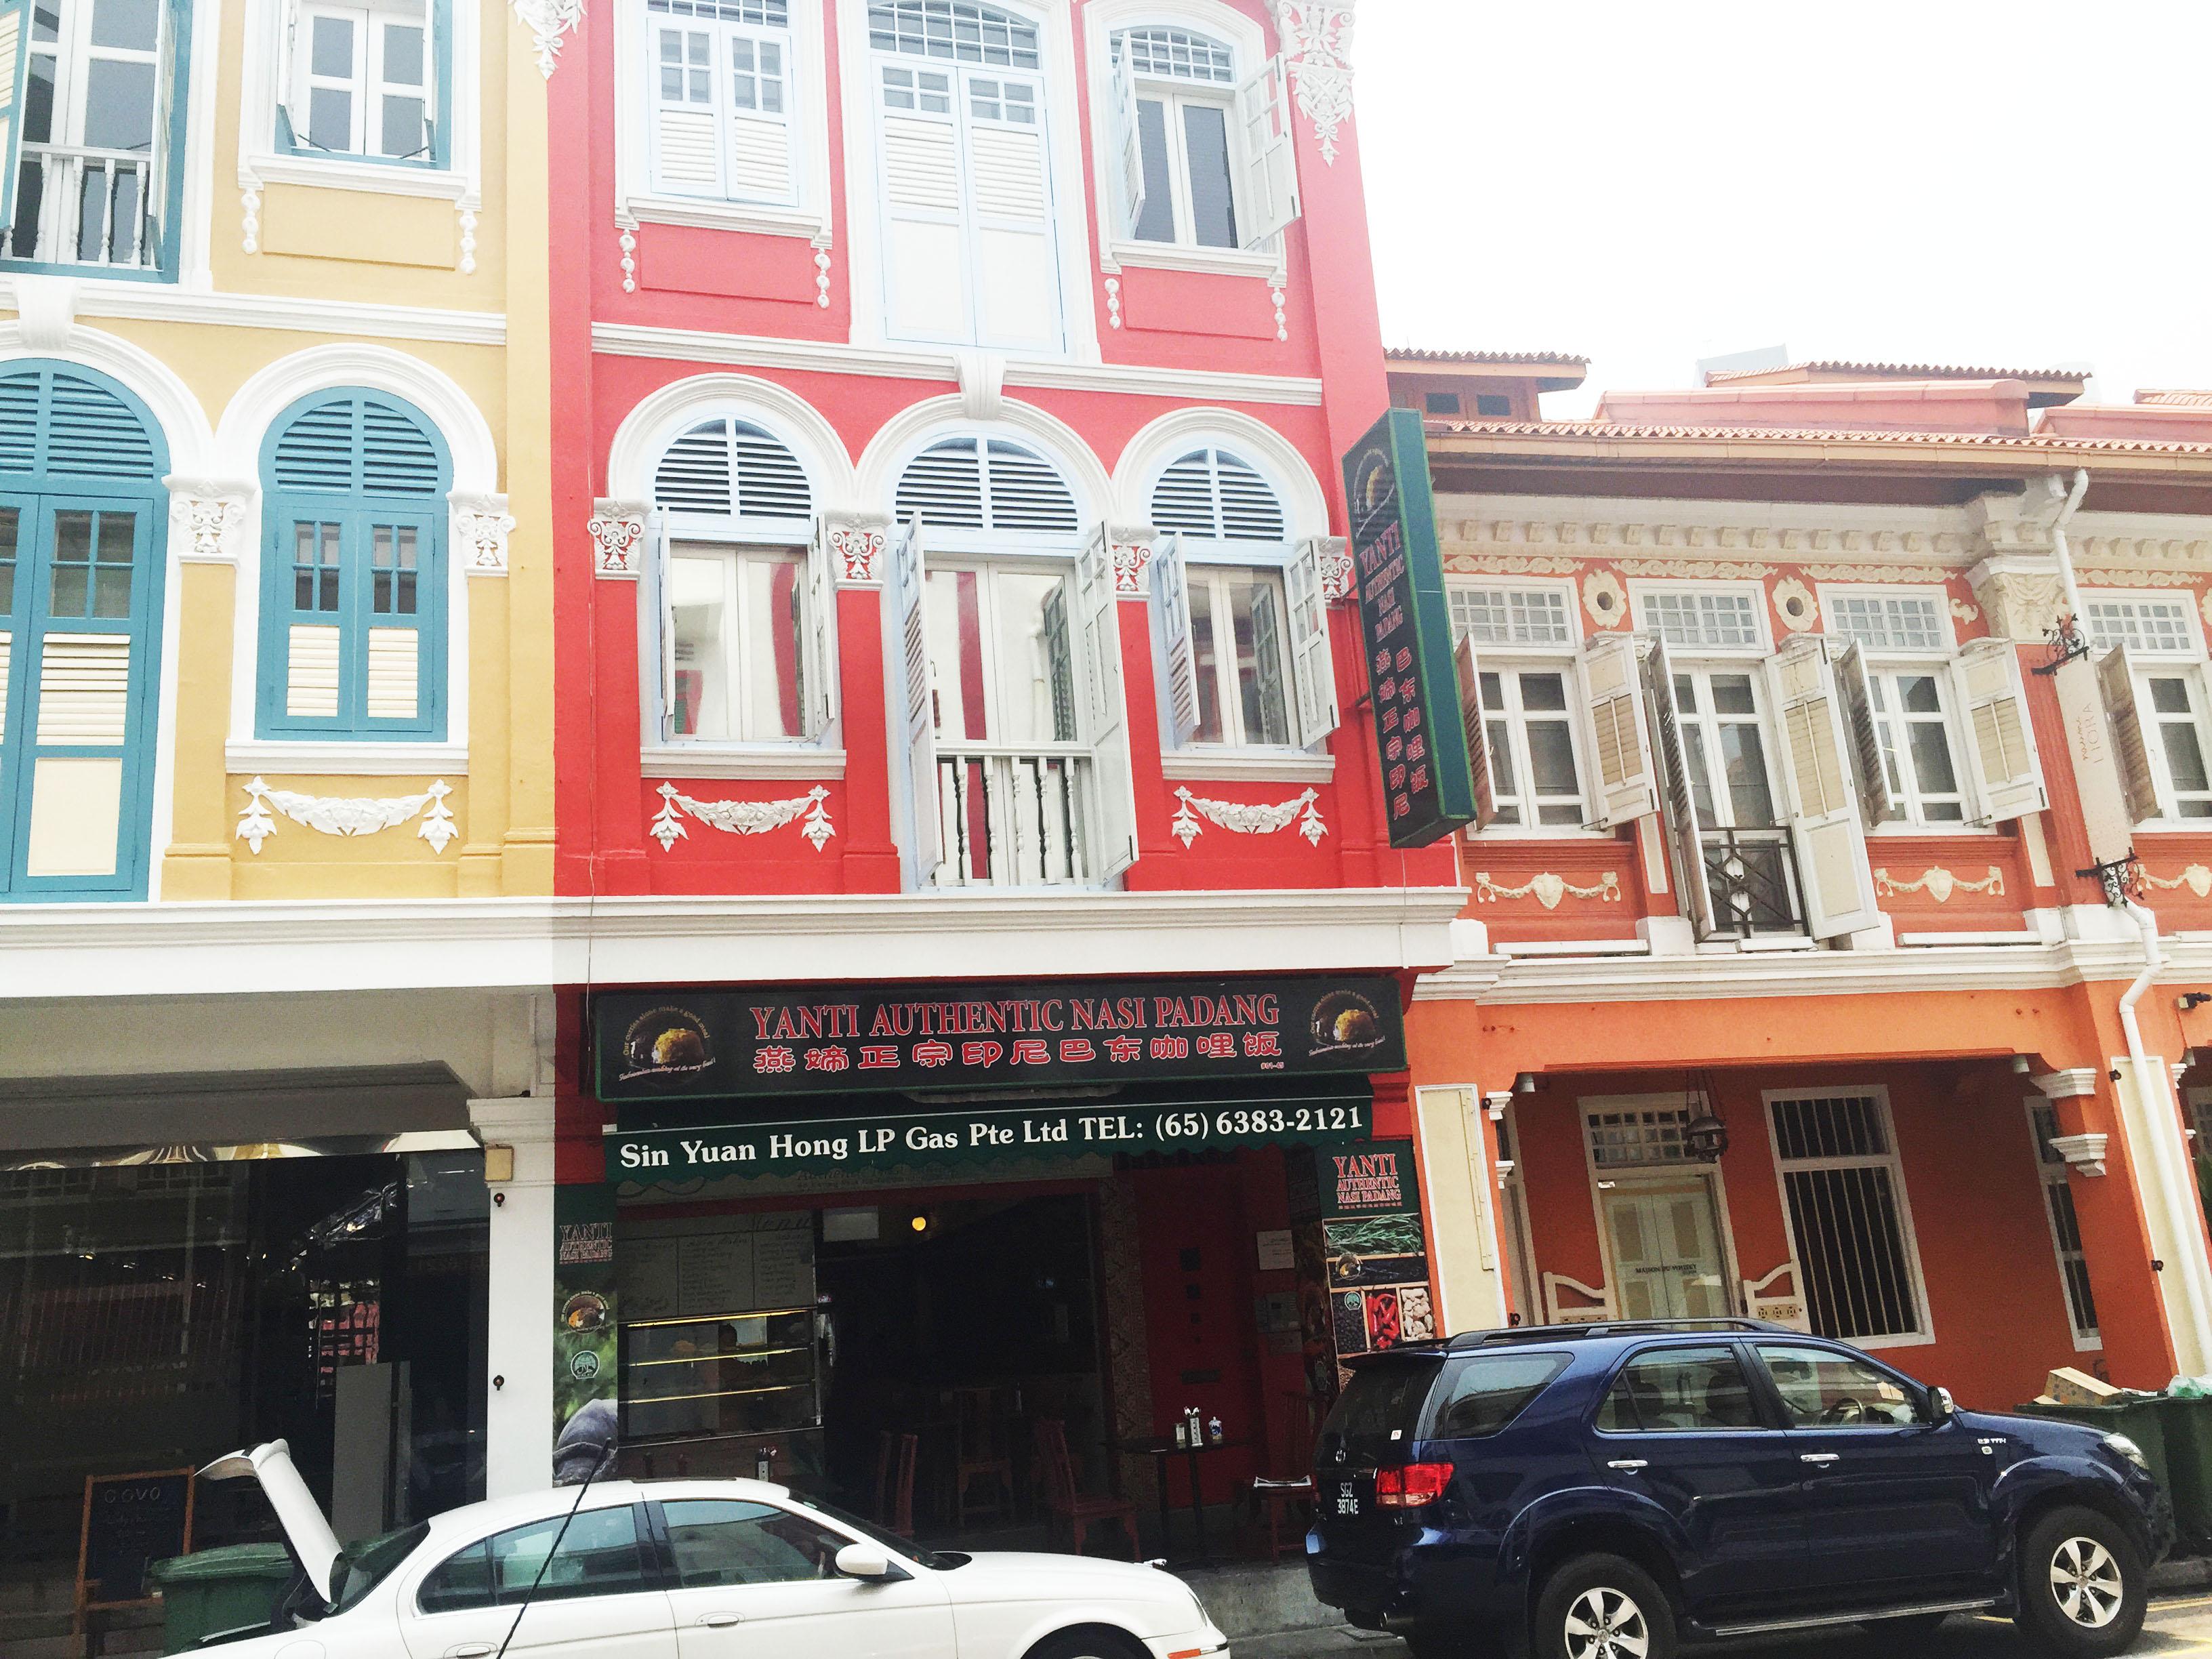 Champagne Twilight - Singapore Chinatown